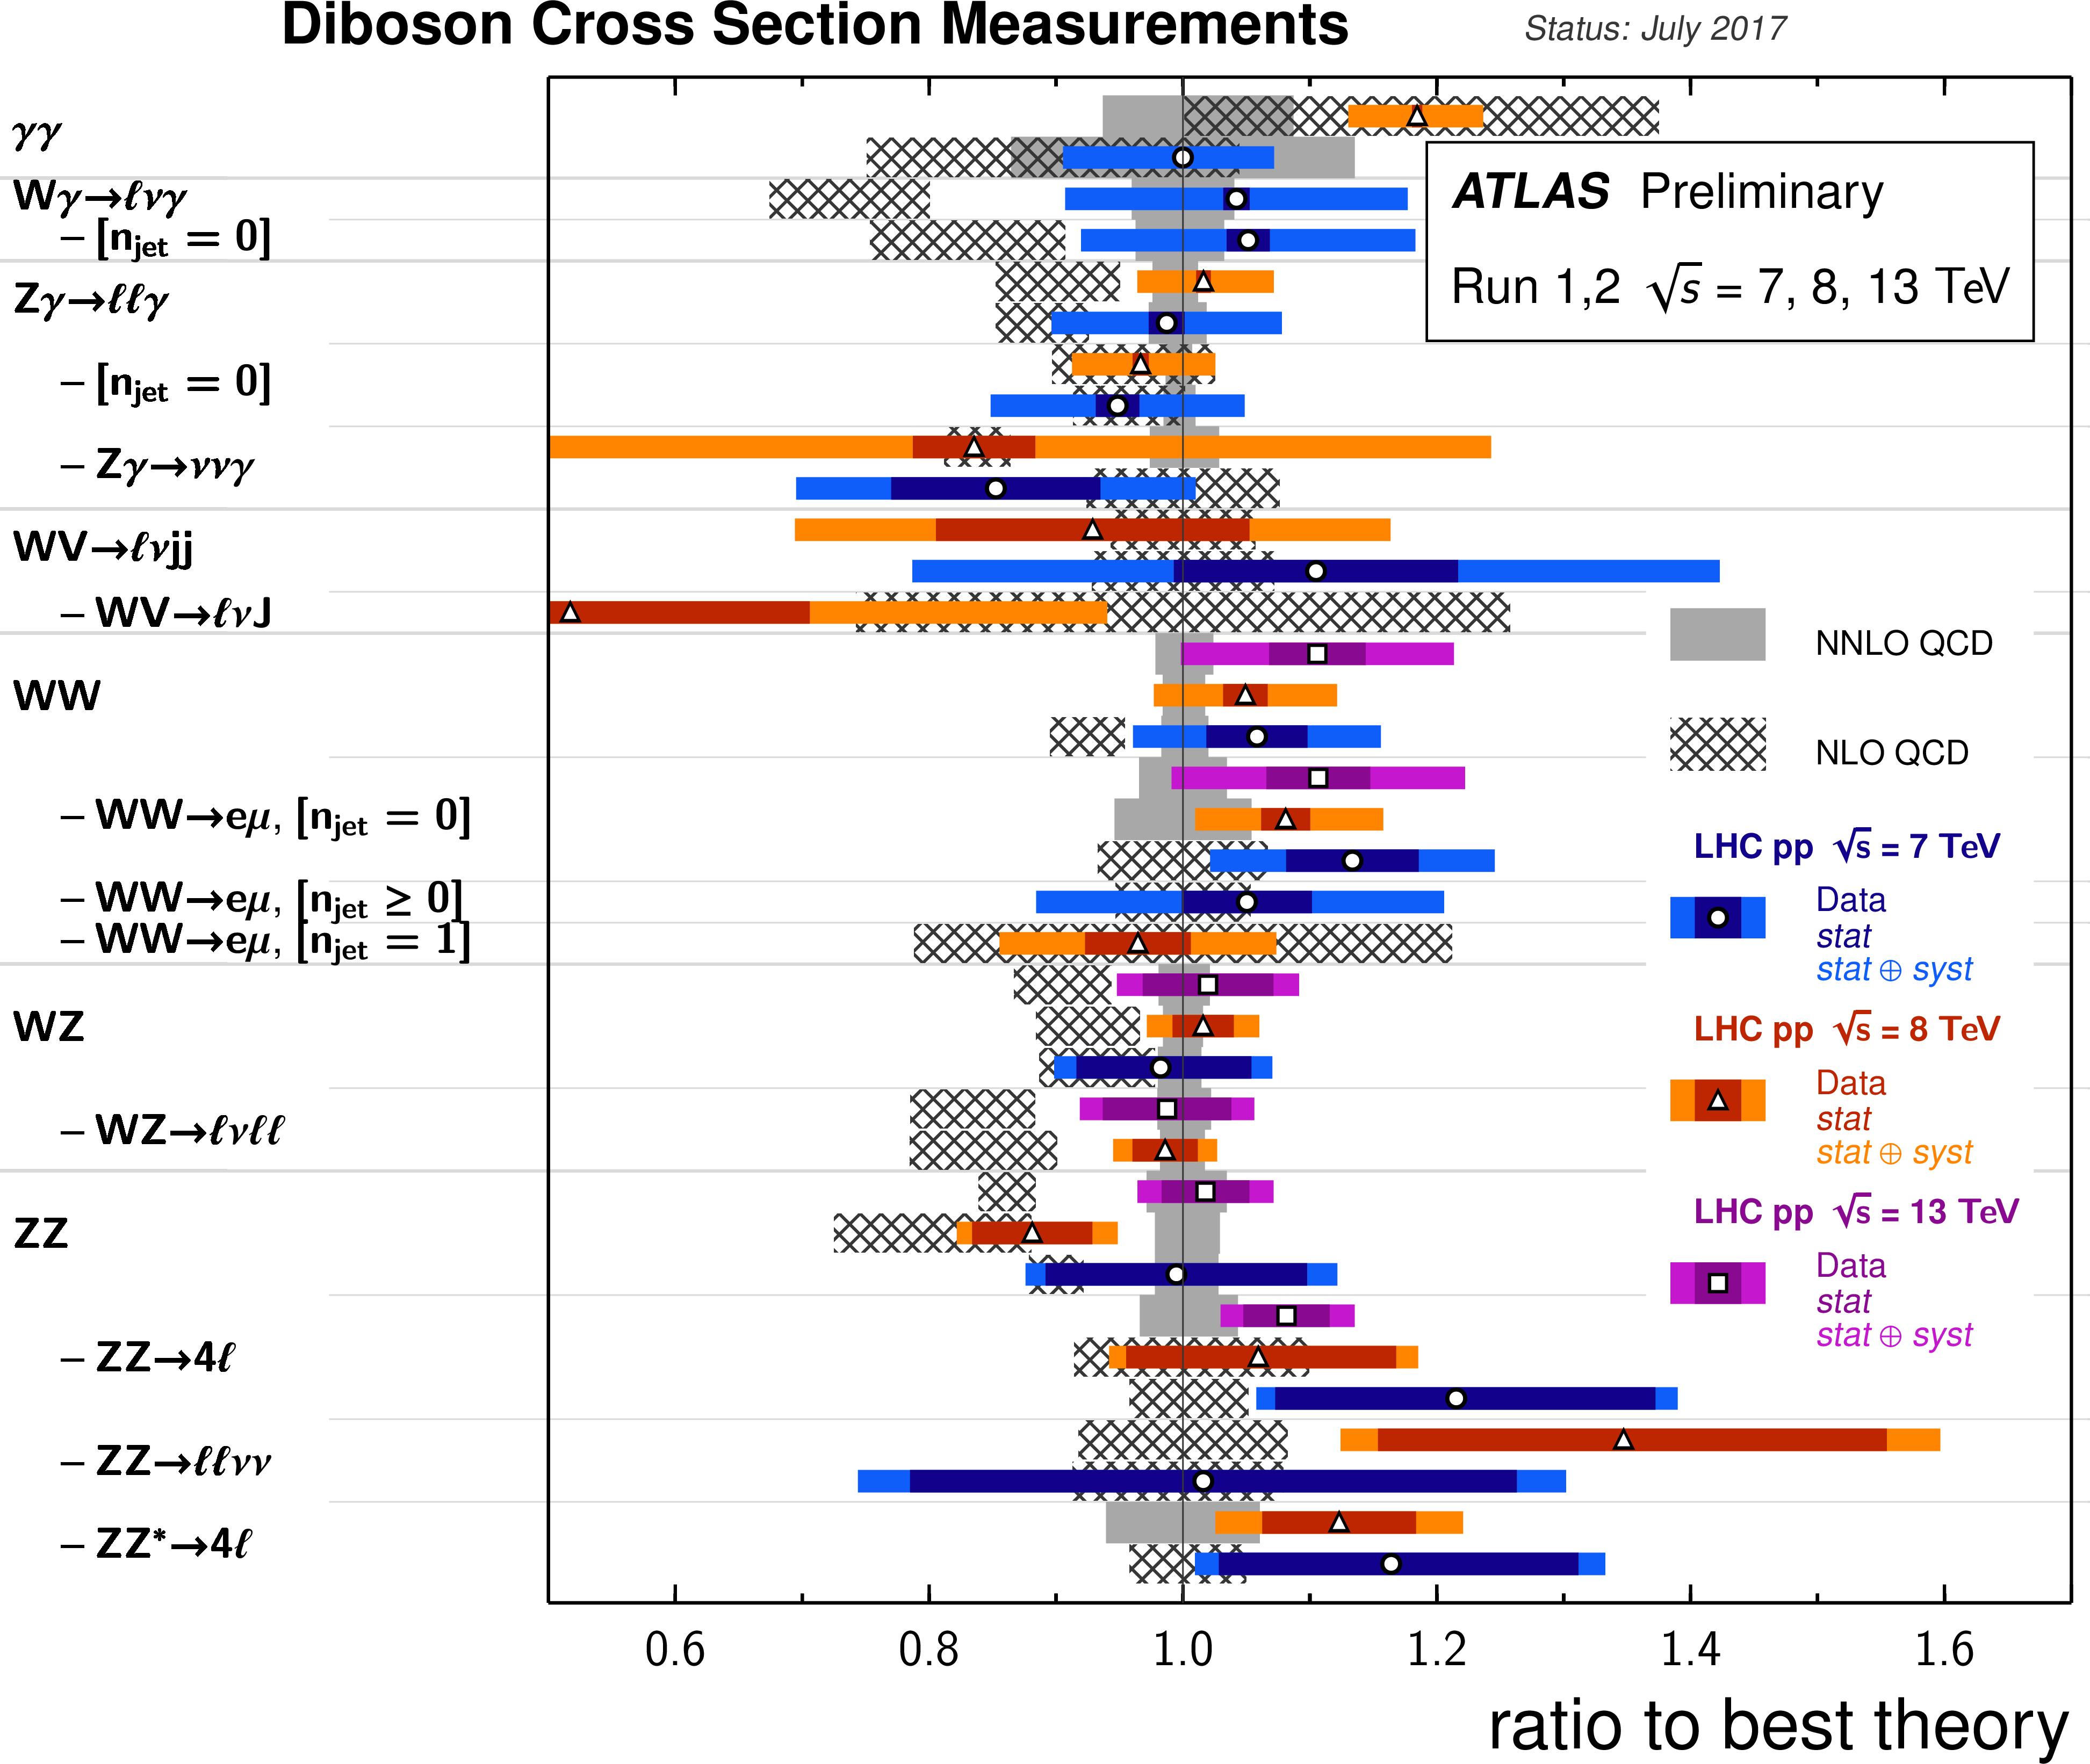 https://atlas.web.cern.ch/Atlas/GROUPS/PHYSICS/CombinedSummaryPlots/SM/ATLAS_i_SMSummary_DiBosonFiducialRatio_Simple/ATLAS_i_SMSummary_DiBosonFiducialRatio_Simple.png